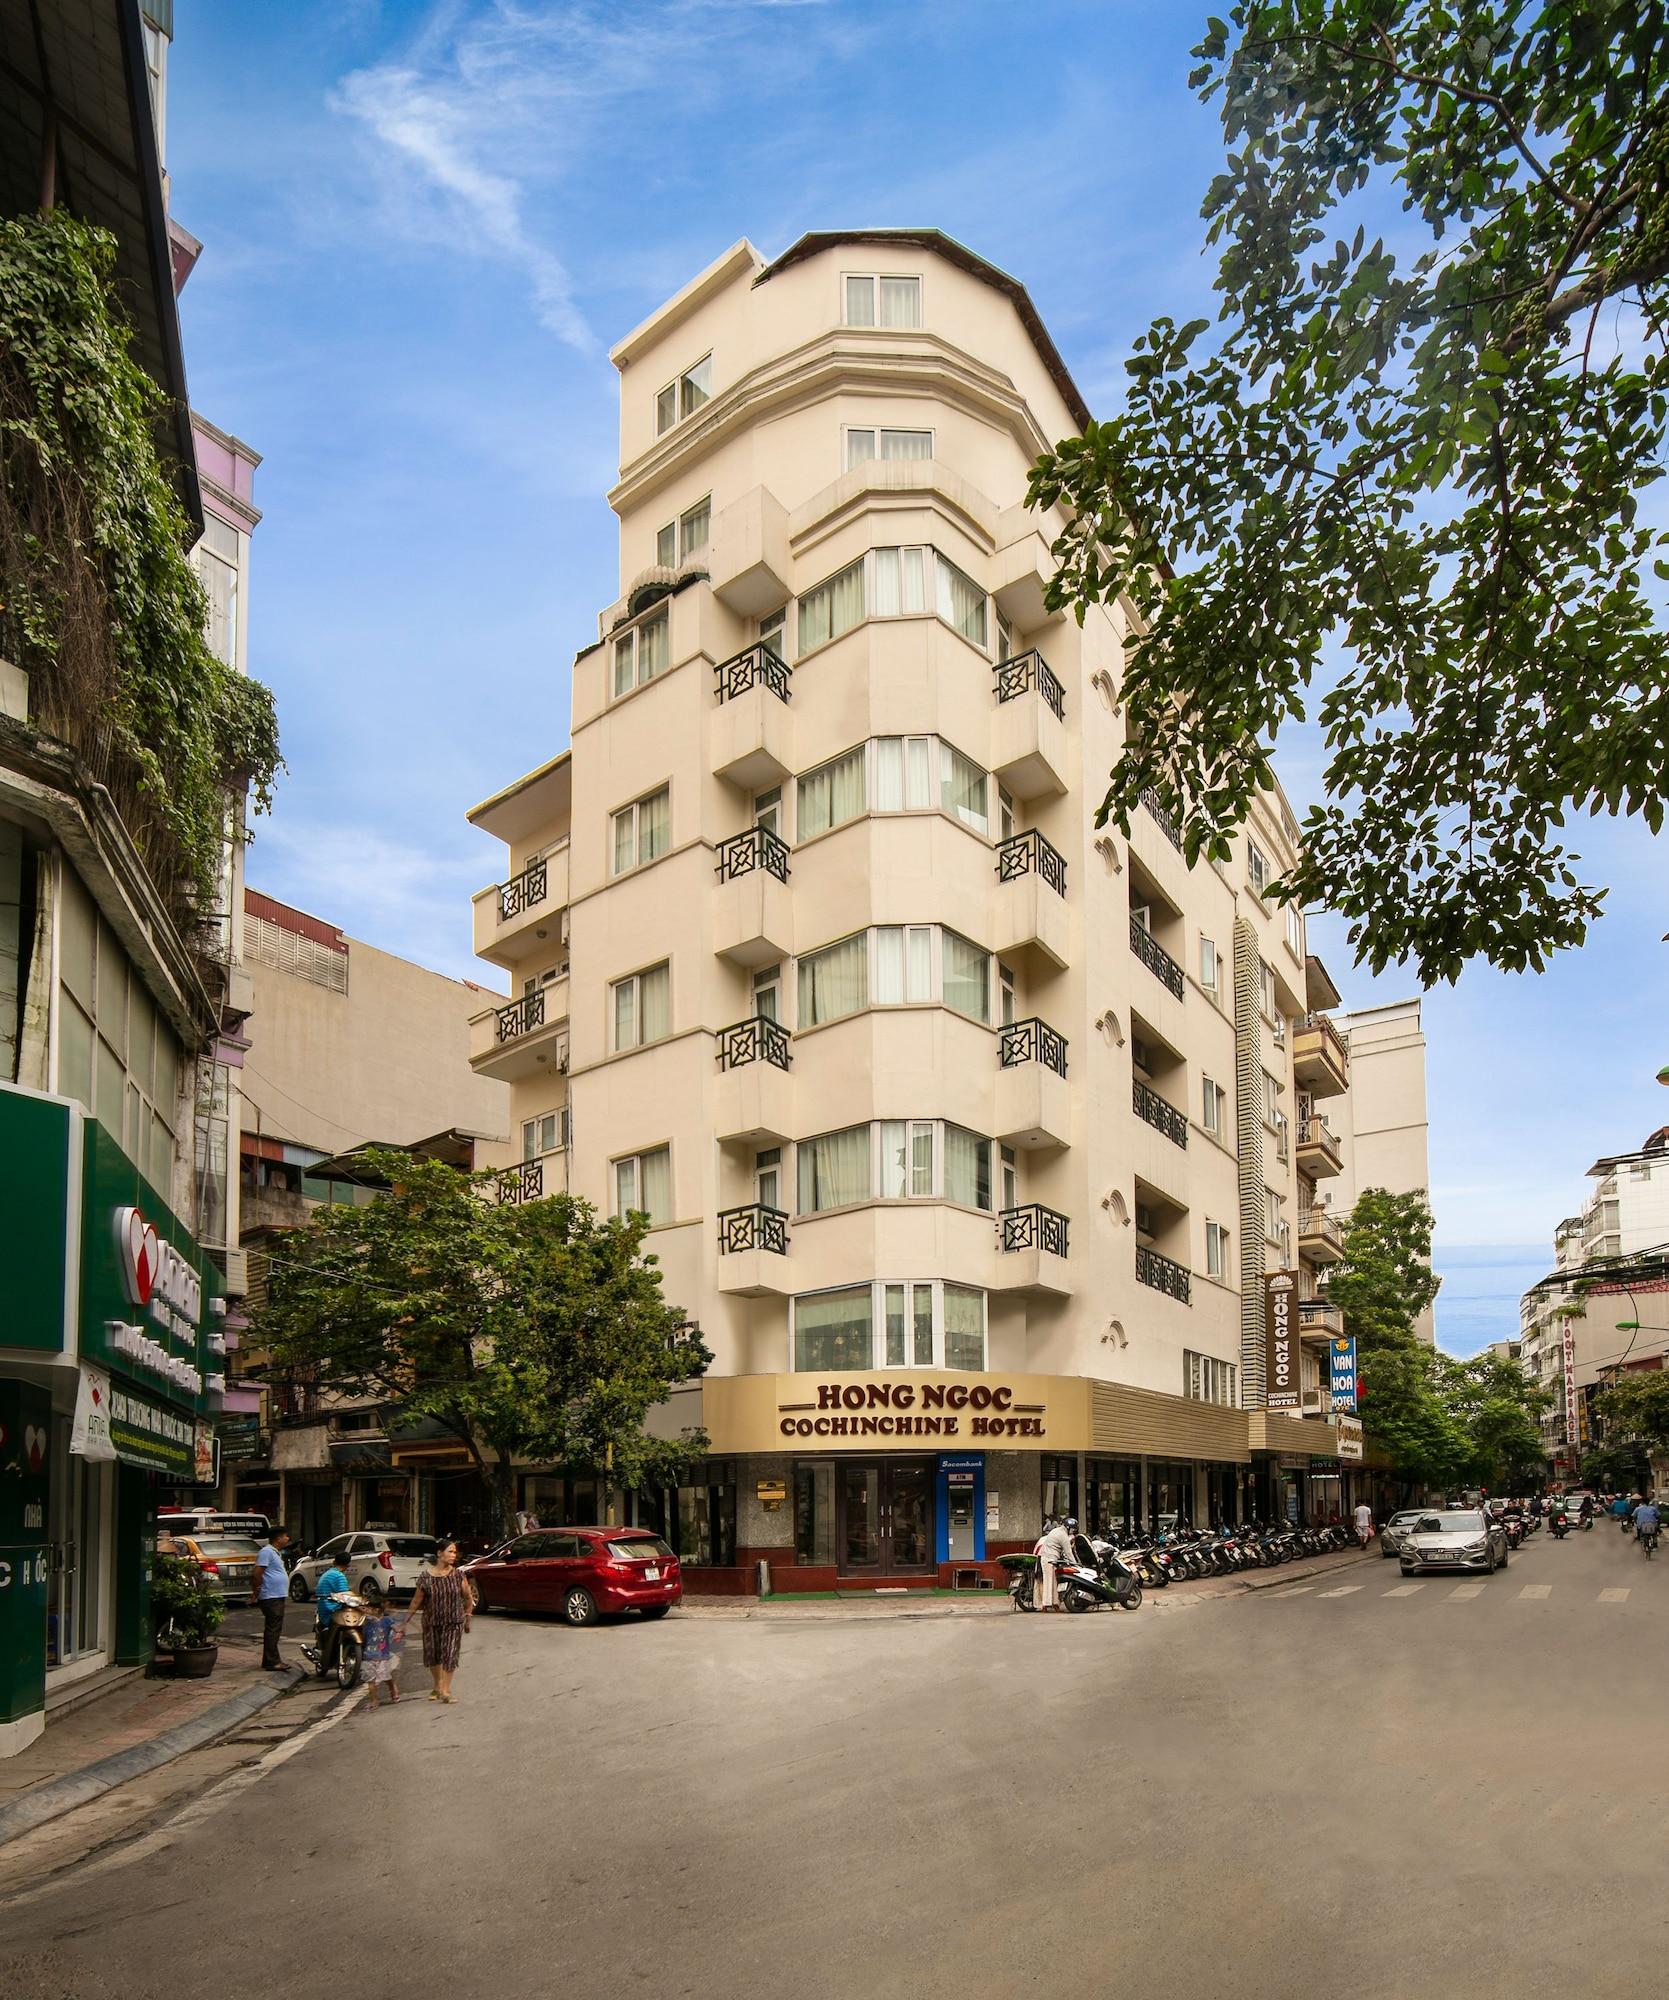 Hong Ngoc Cochincine Boutique Hotel & Spa, Ba Đình